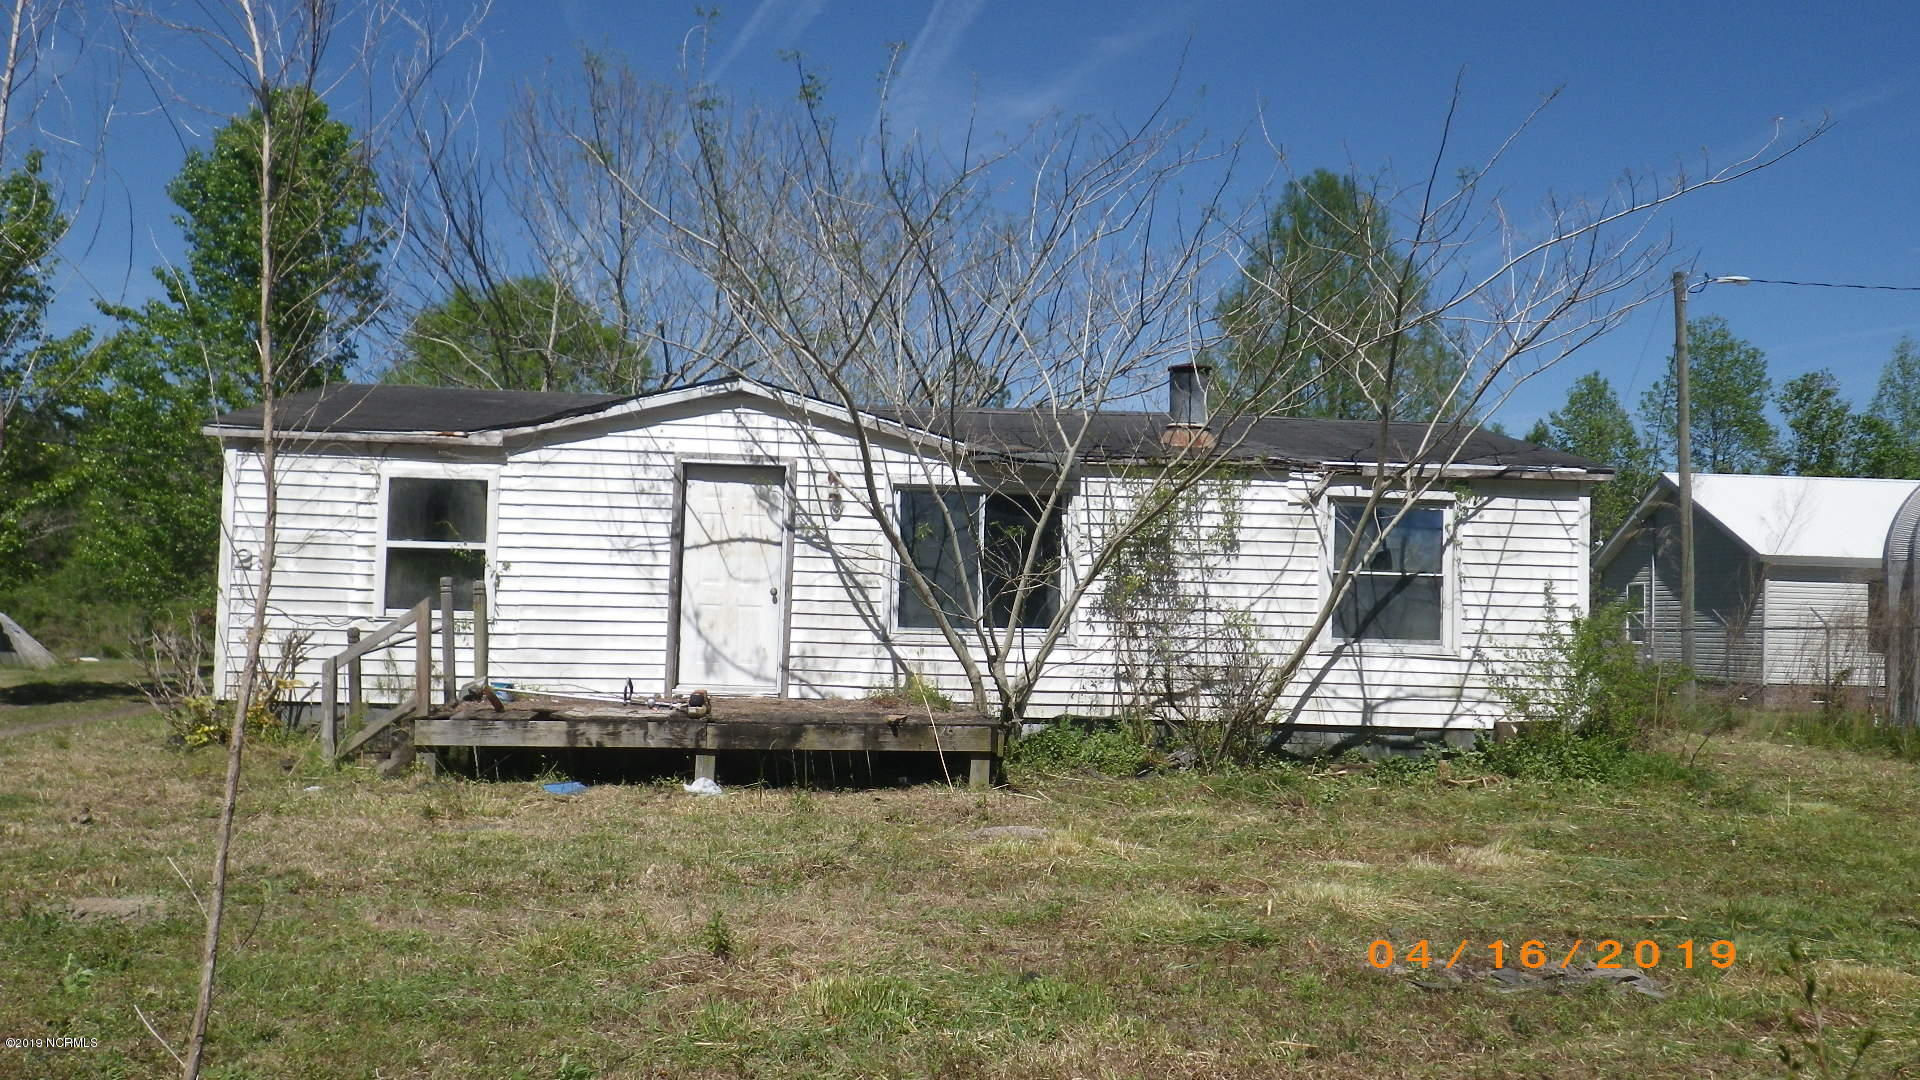 Hubert, North Carolina, 3 Bedrooms Bedrooms, 6 Rooms Rooms,2 BathroomsBathrooms,Manufactured home,For sale,100160859